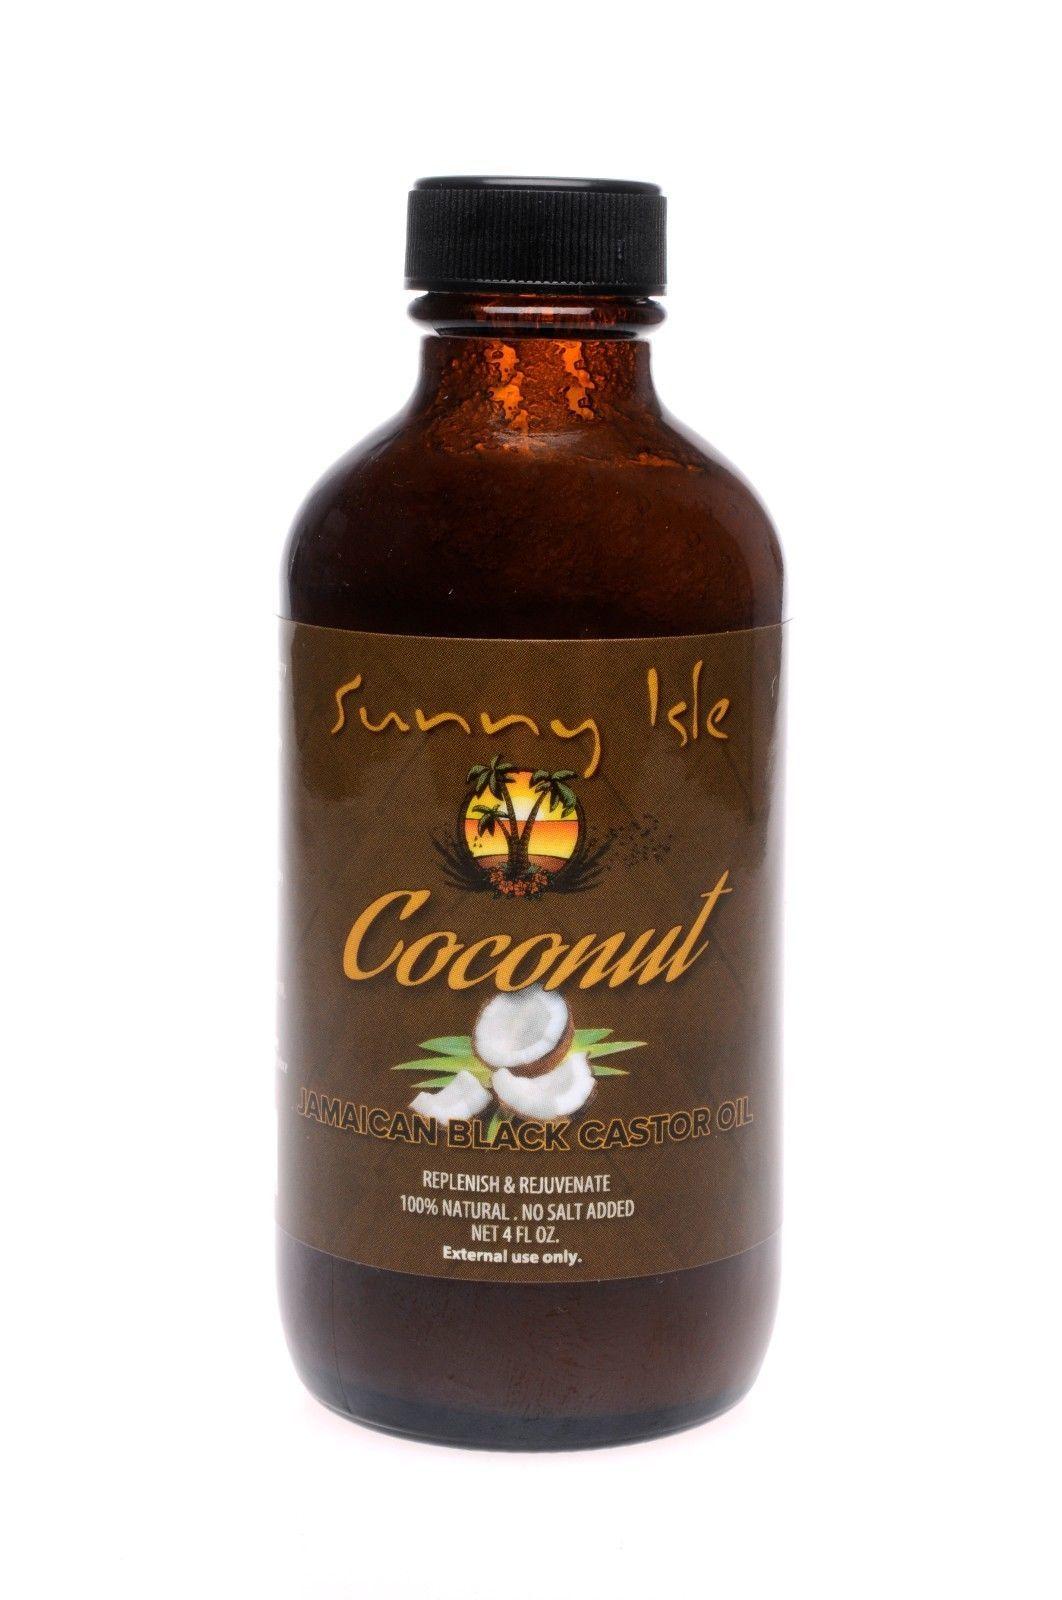 sunny isle coconut jamaican black castor oil replenish and rejuvenate 4oz serum oils. Black Bedroom Furniture Sets. Home Design Ideas